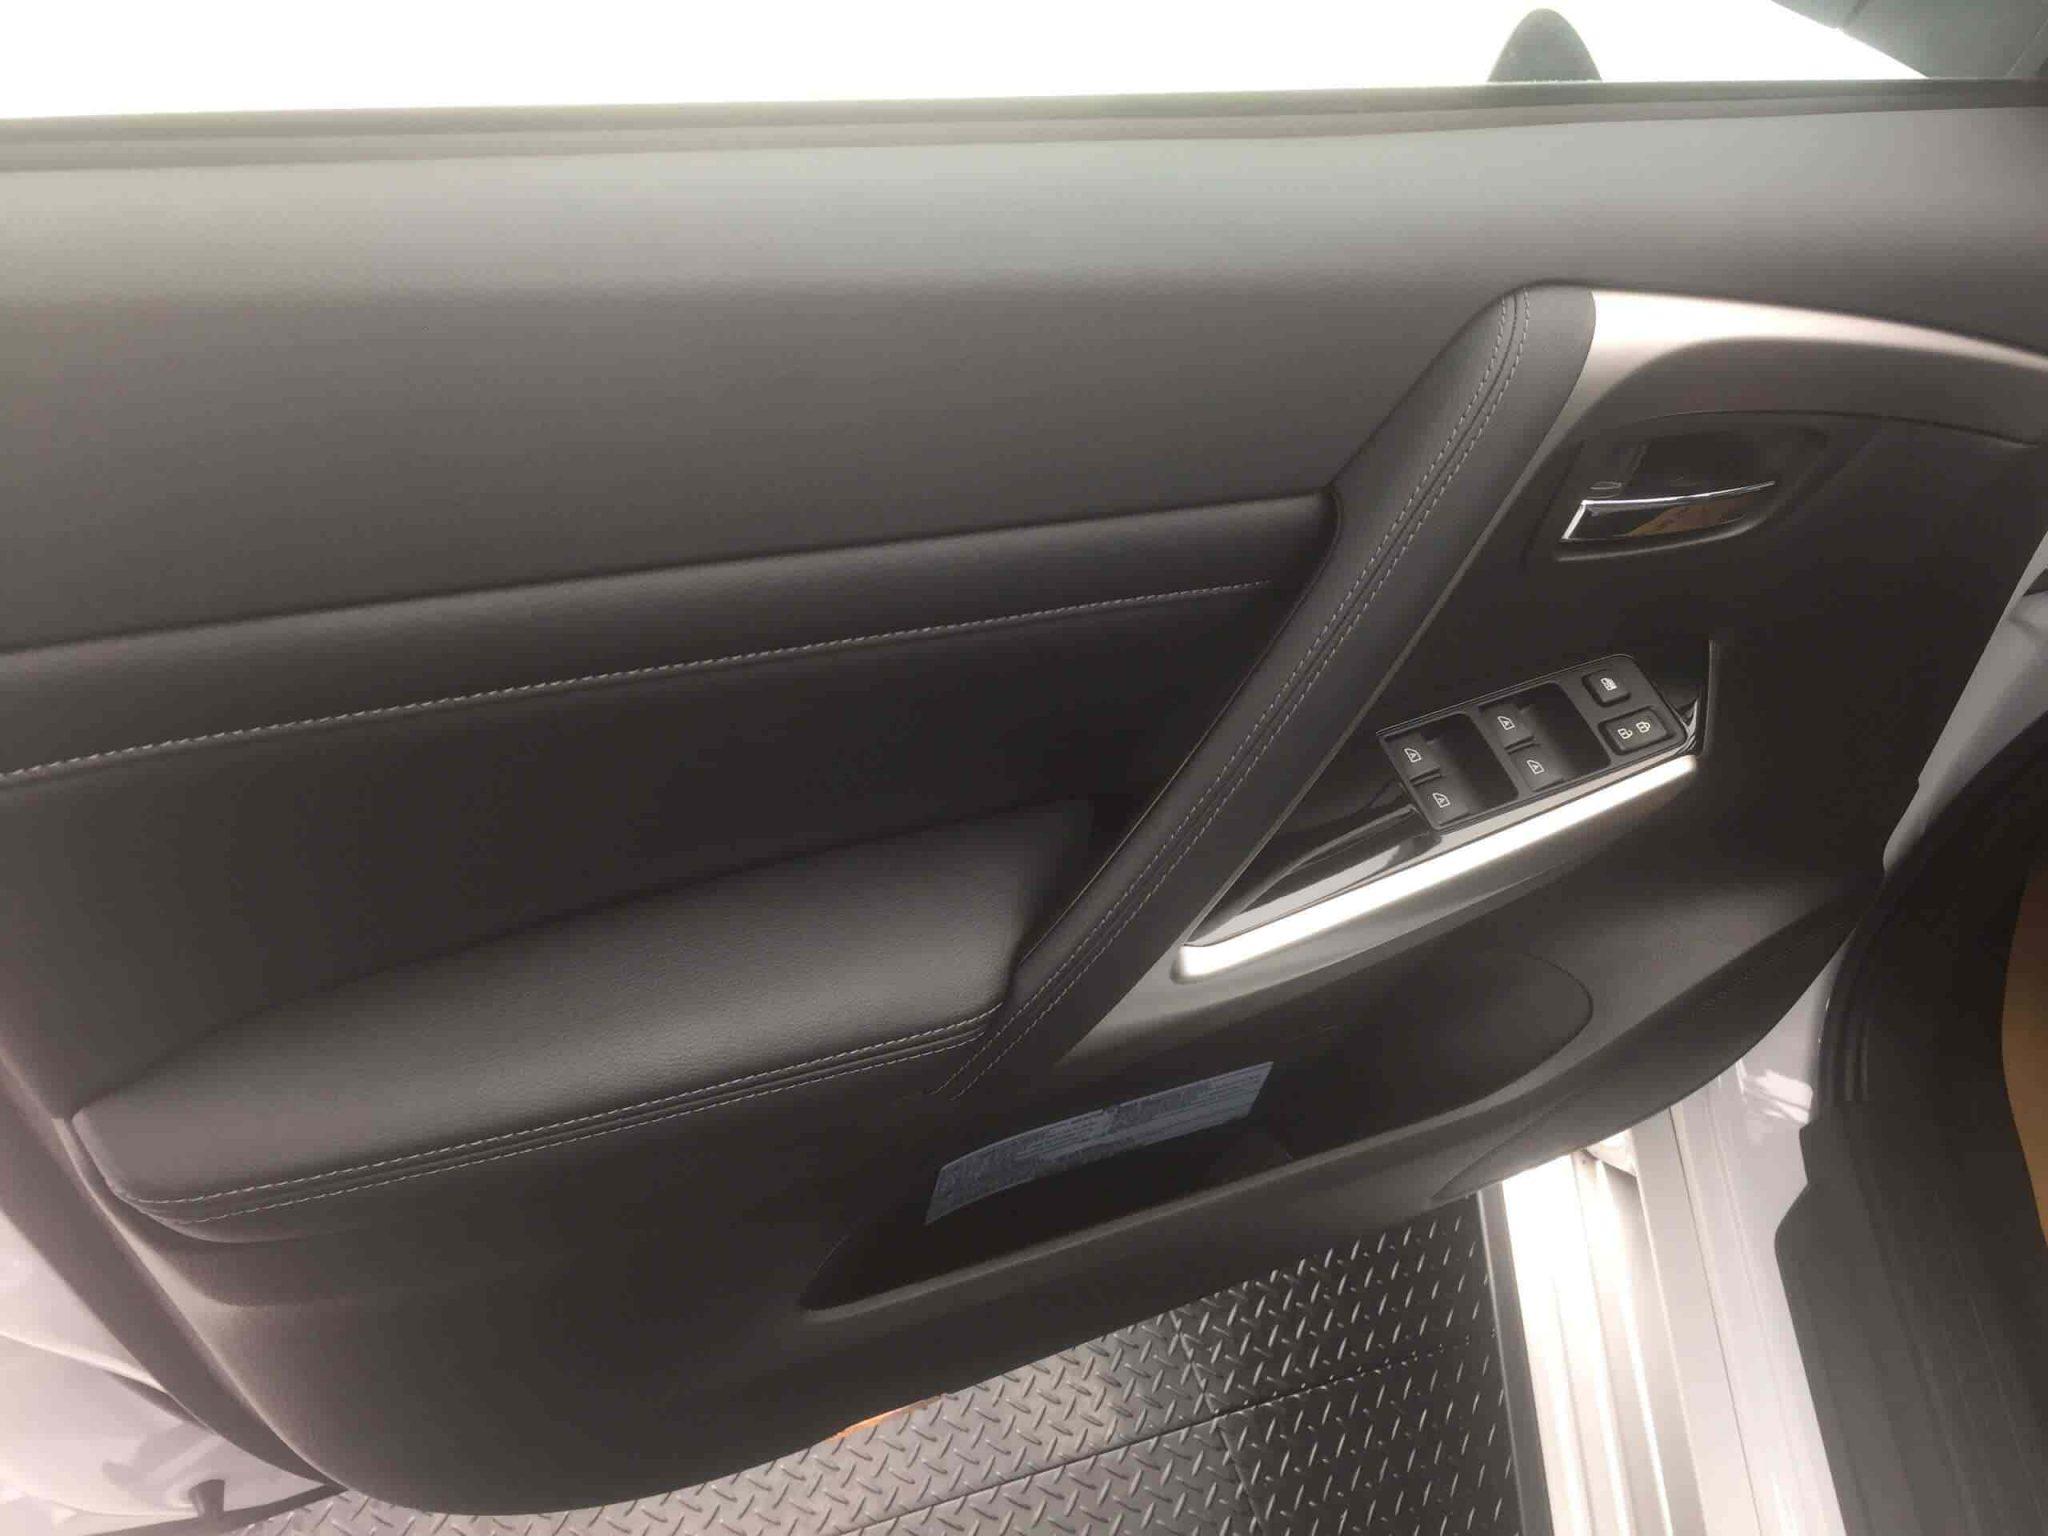 Giá xe Mitsubishi Pajero Sport 2021. - AutoVietNam